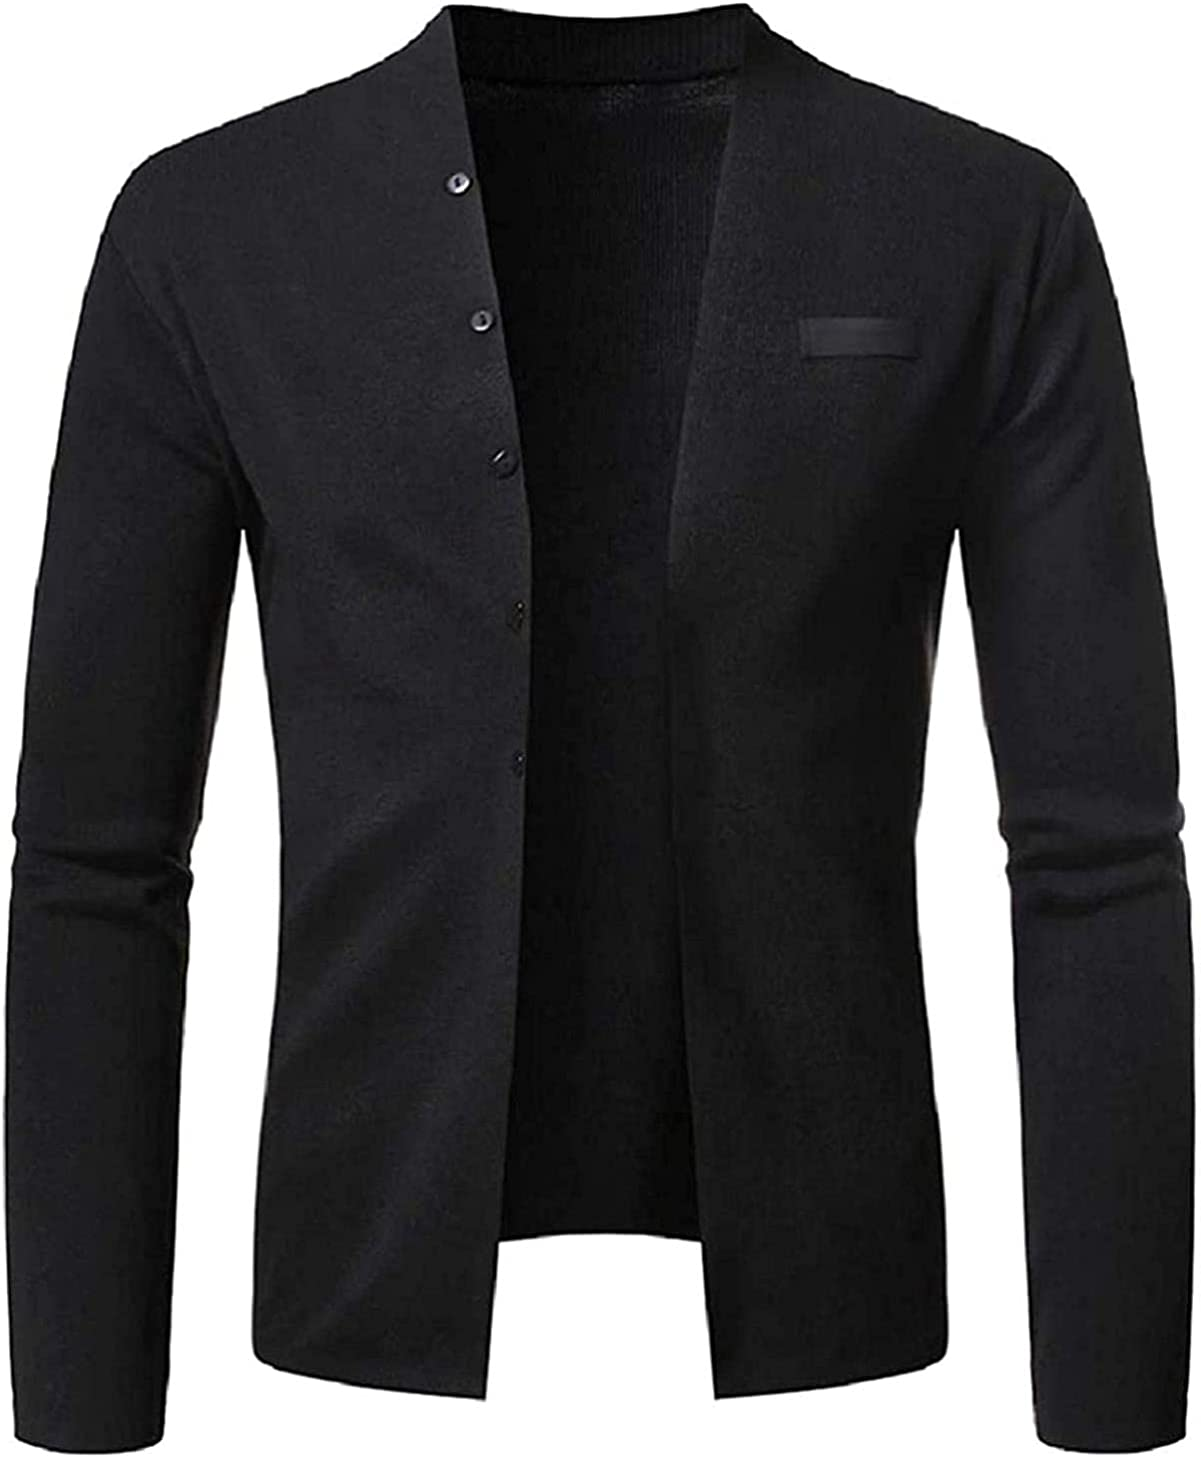 Men Knitwear Stand Collar Fashion Buttons Slim Sweater Cardigan